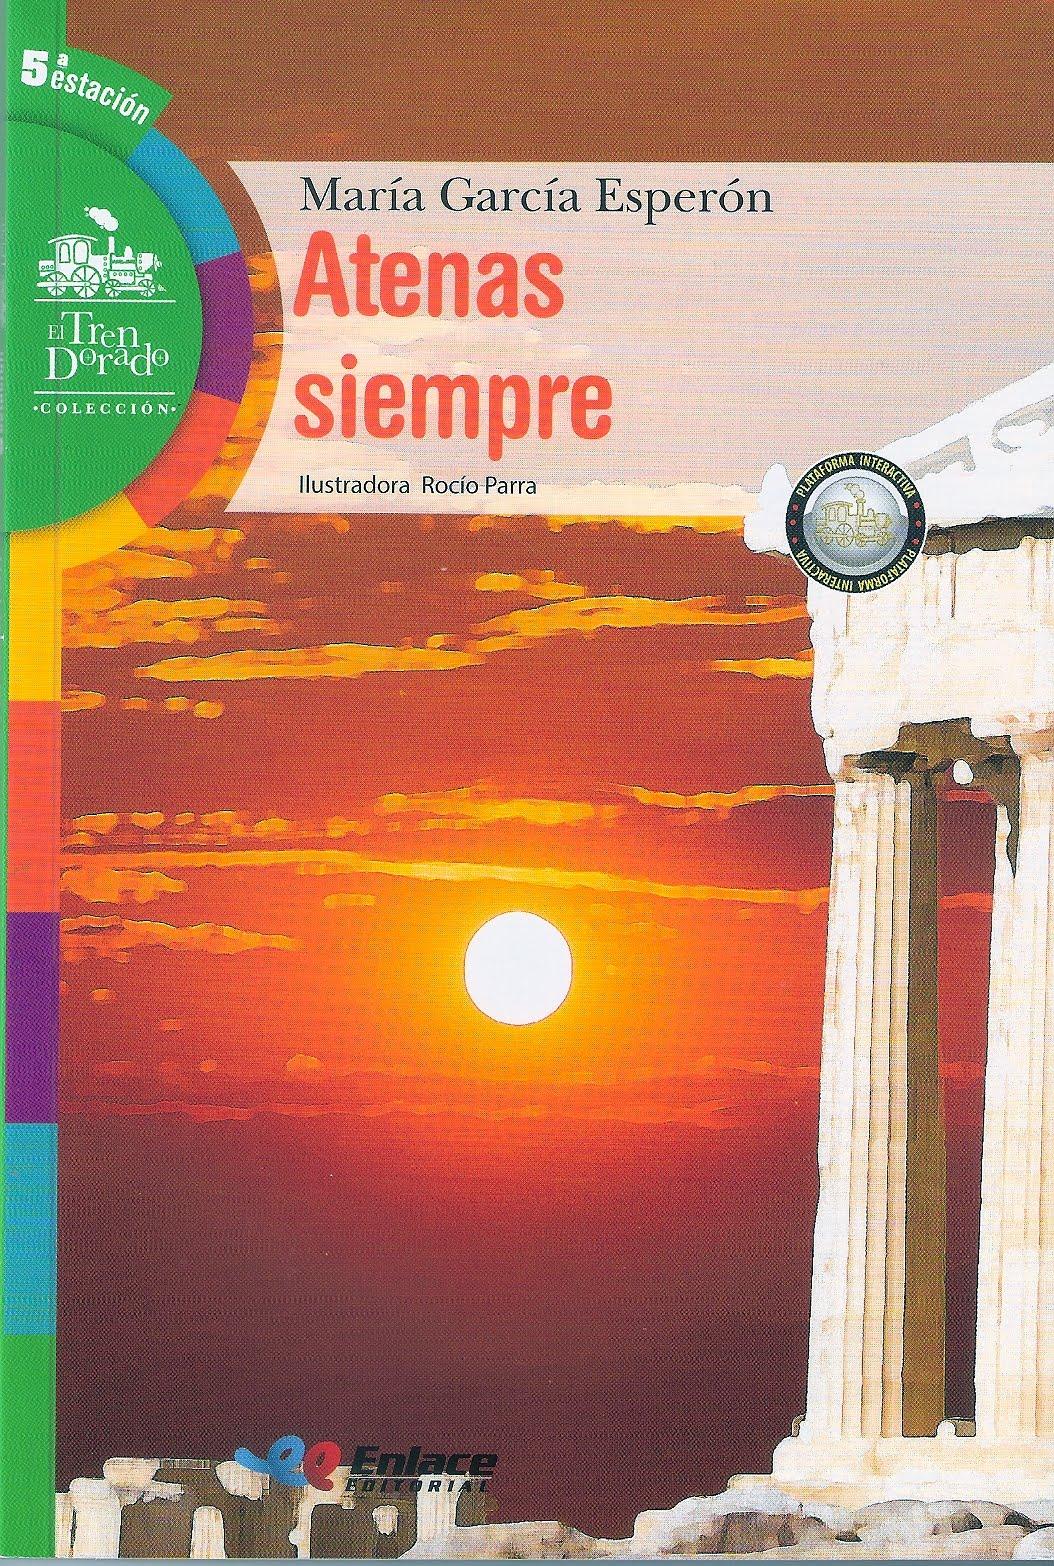 Atenas siempre